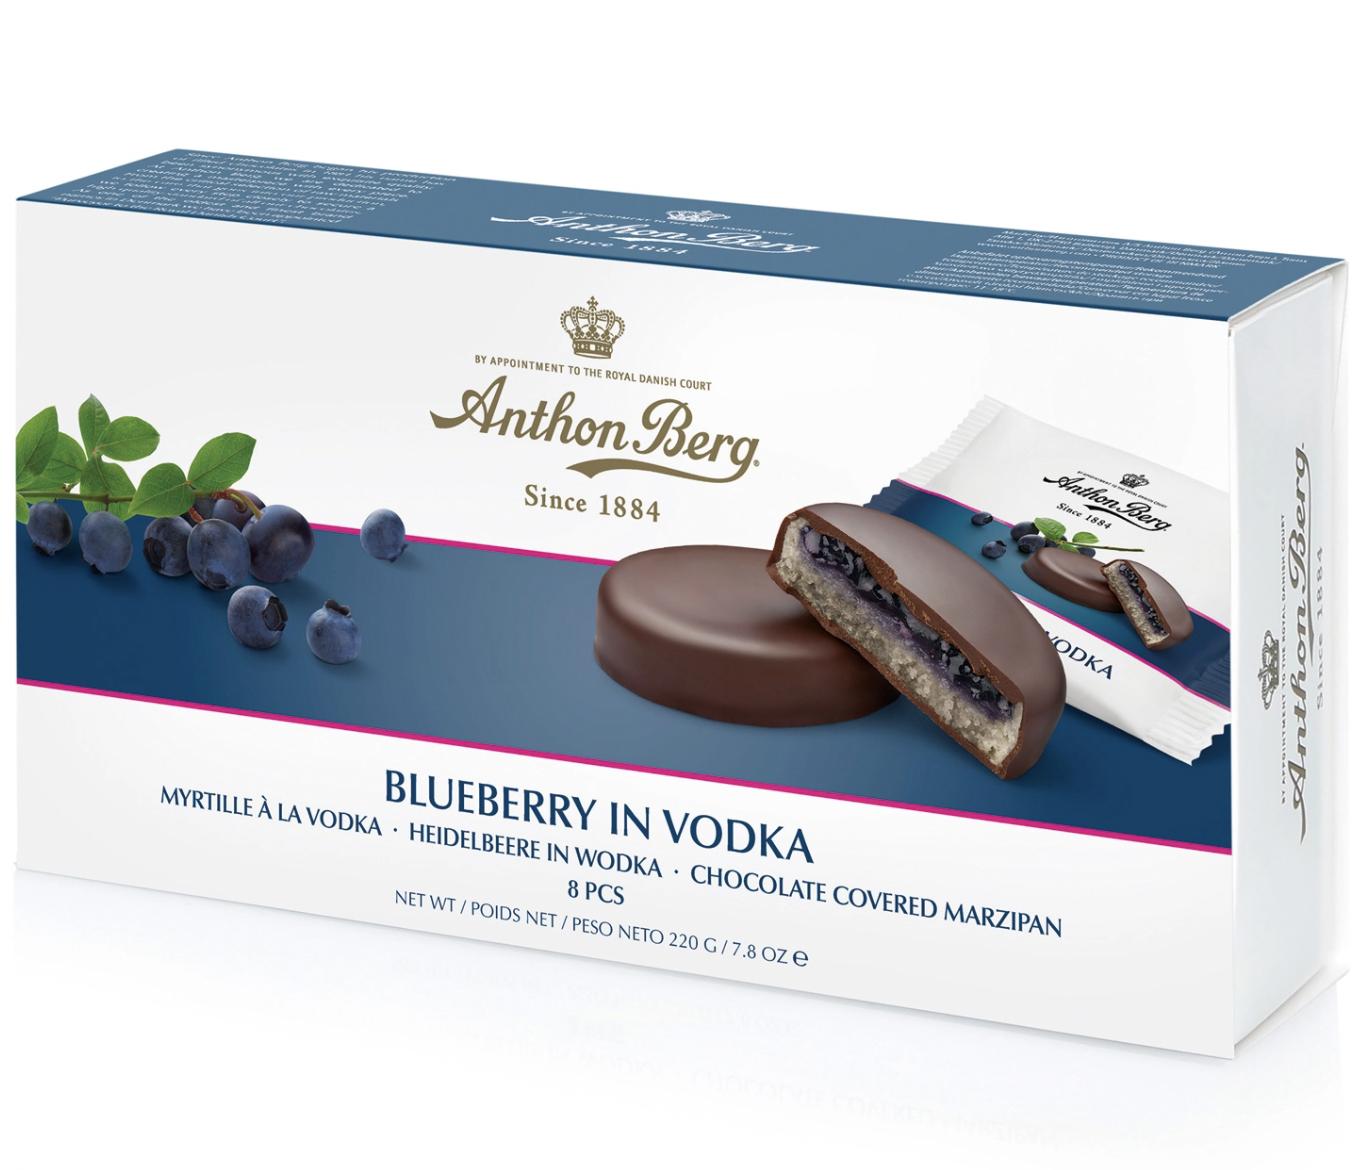 Anthon Berg Blueberry in Vodka 220g